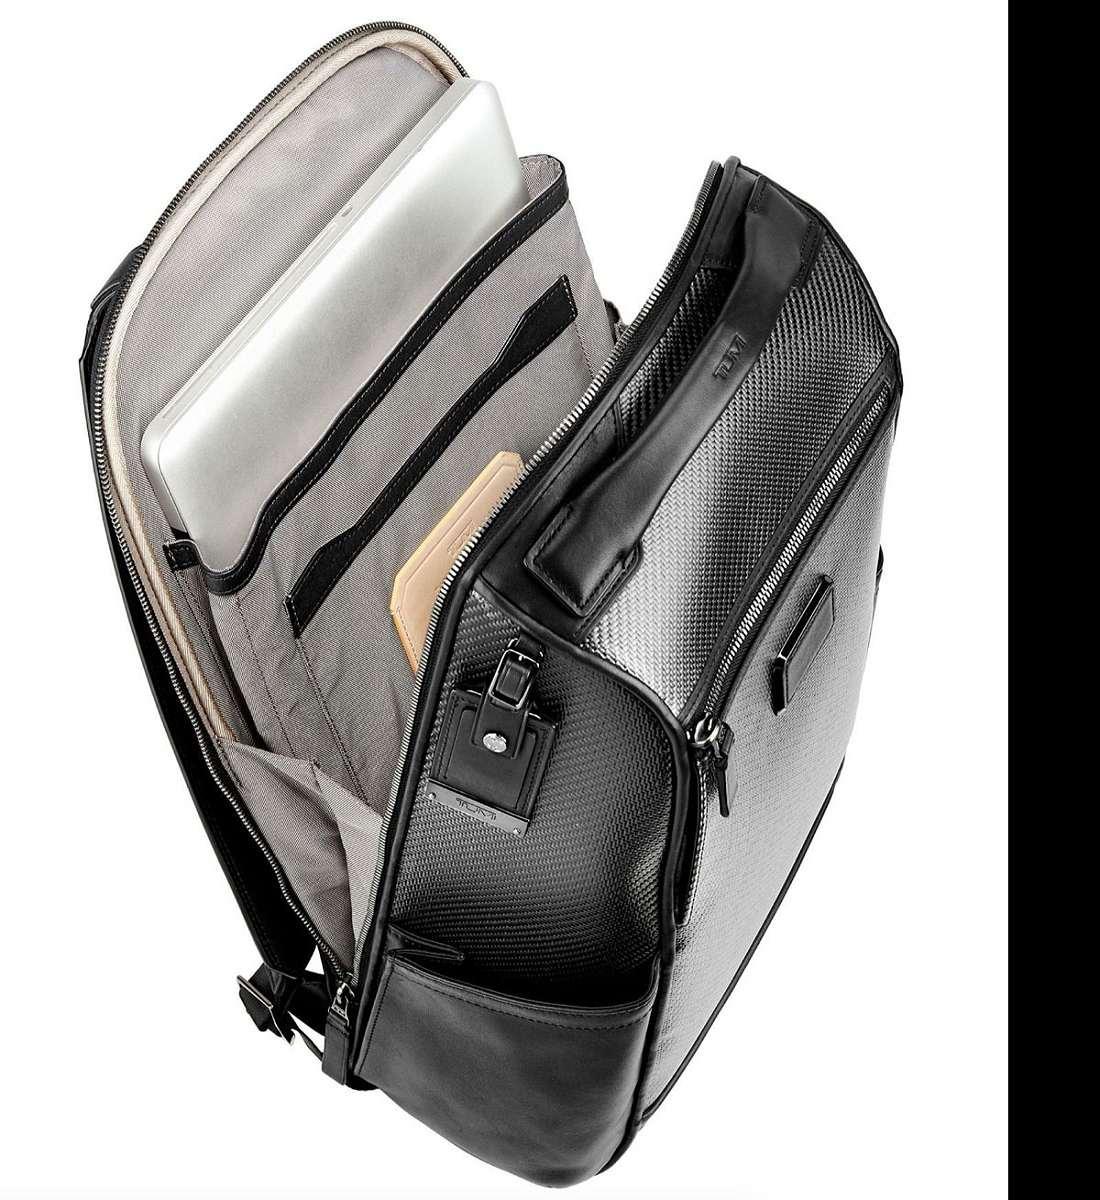 Tumi Cfx Carbon Fiber Backpack Dudeiwantthat Com